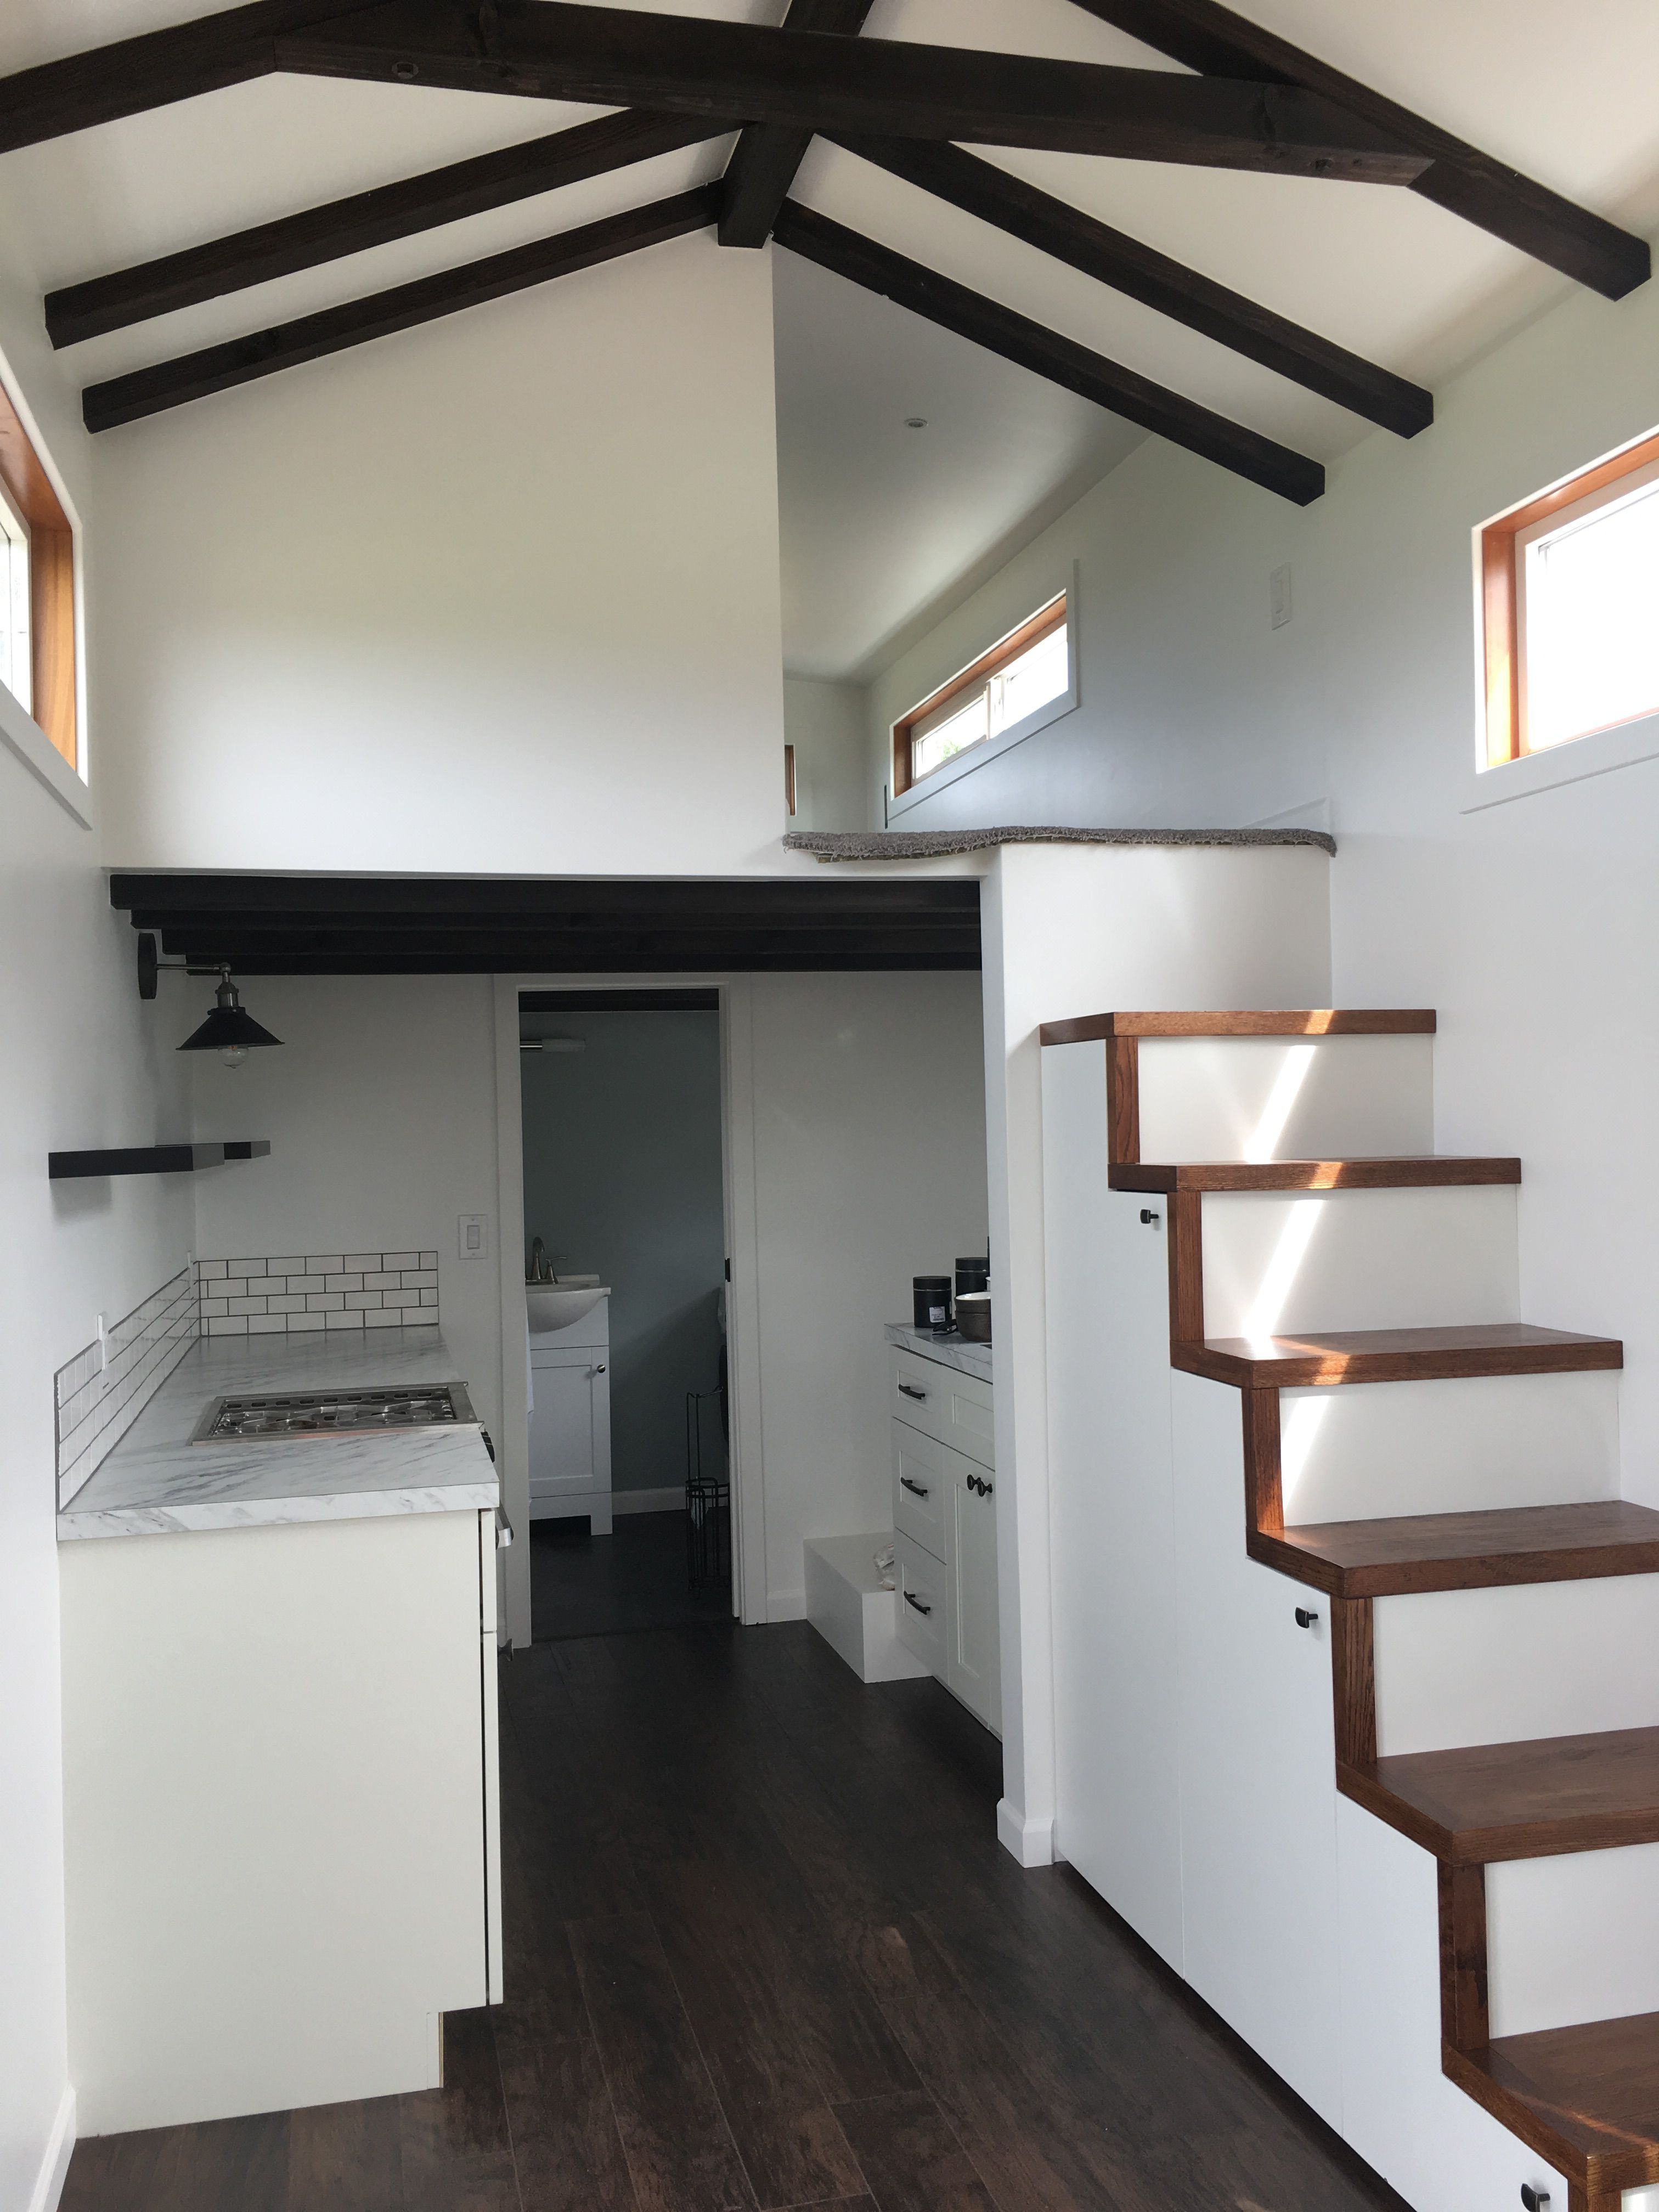 Self Built Tiny House On Wheels Maui Tiny House Modern Tiny Home Open Floor Plan Modern Tiny House Tiny House Layout Tiny House Plans